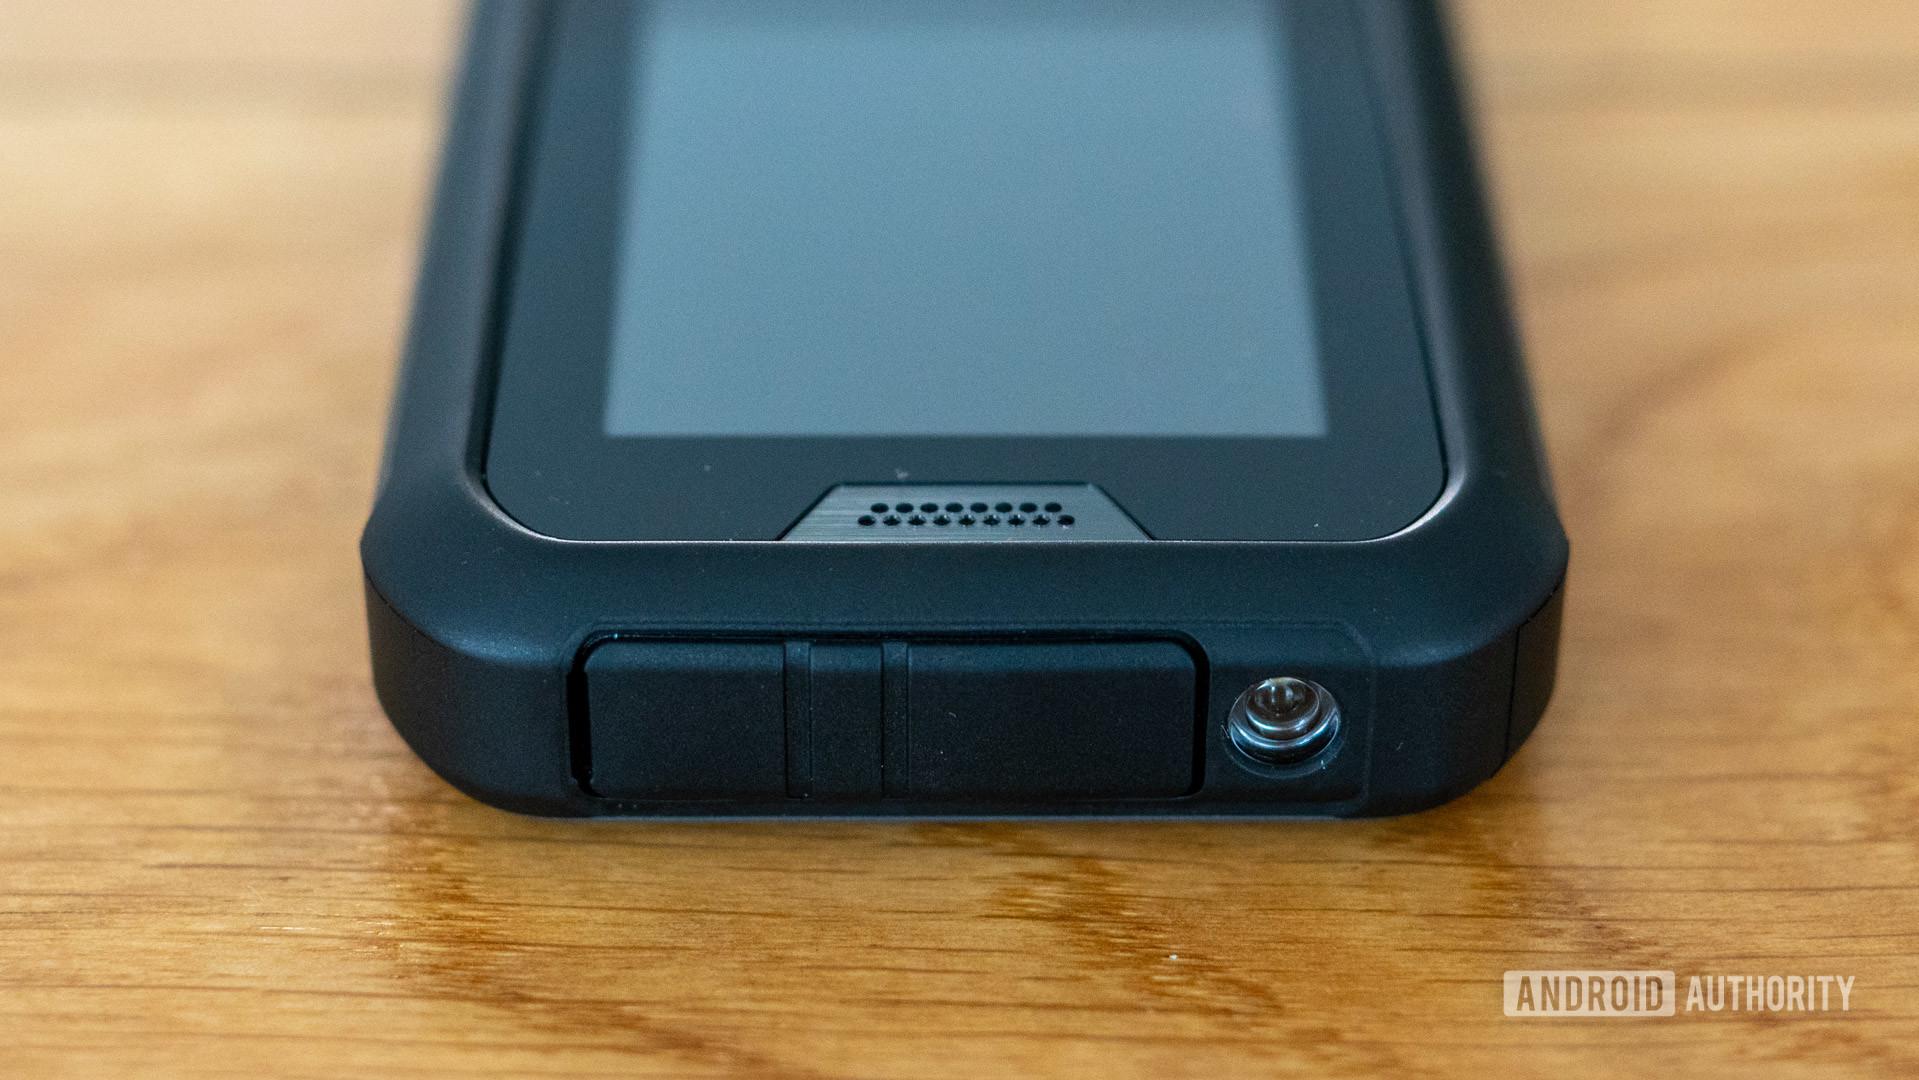 Nokia 800 Tough review earpiece speaker and flashlight